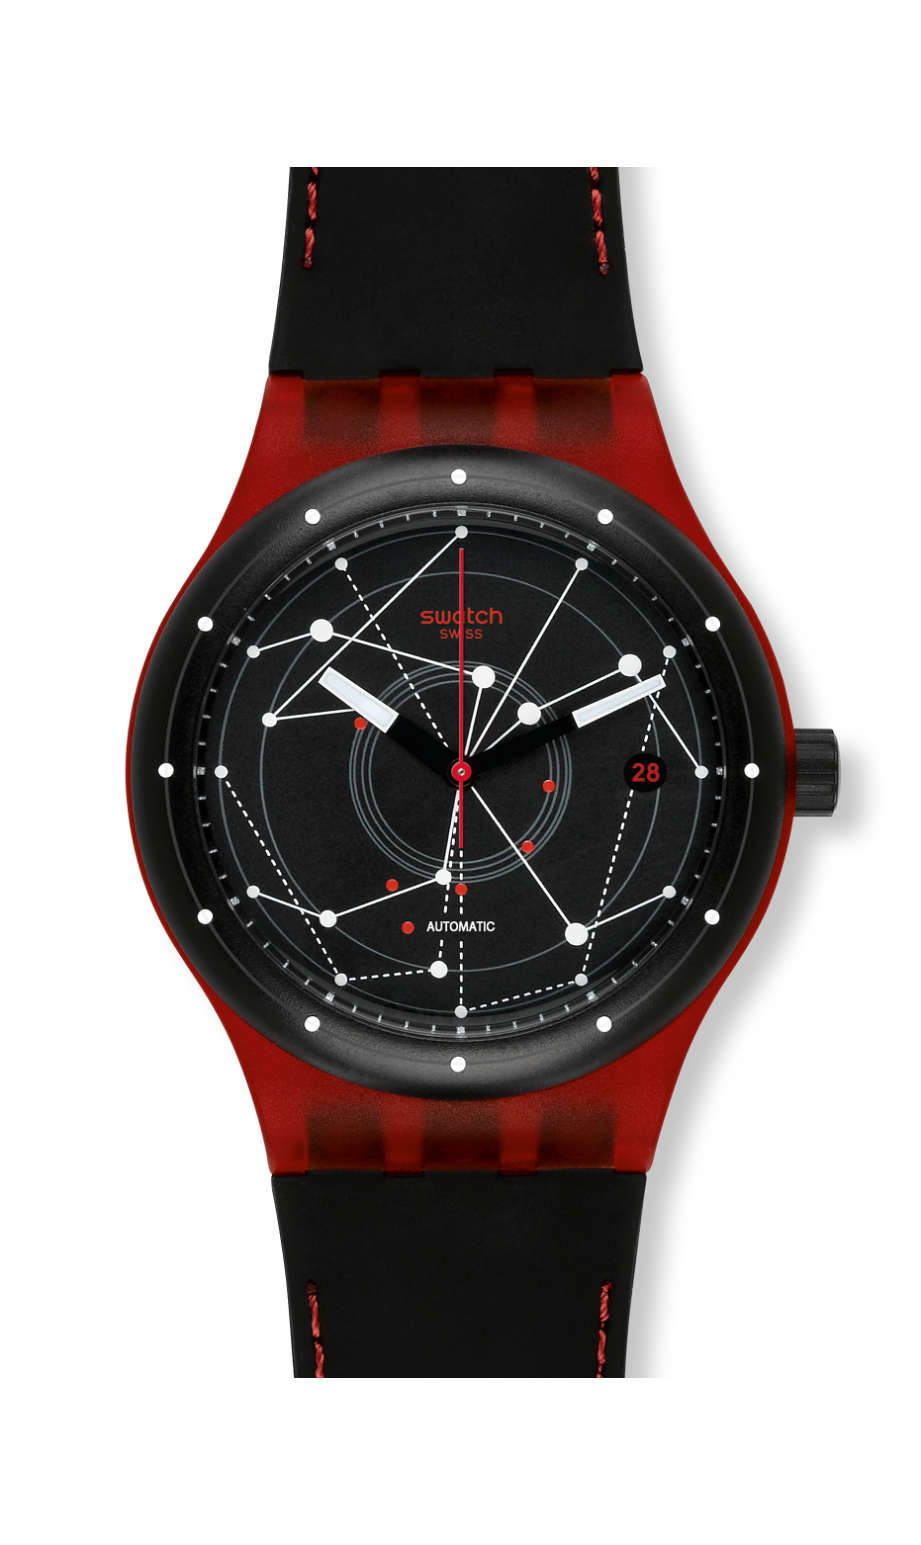 Swatch - SISTEM RED - 1